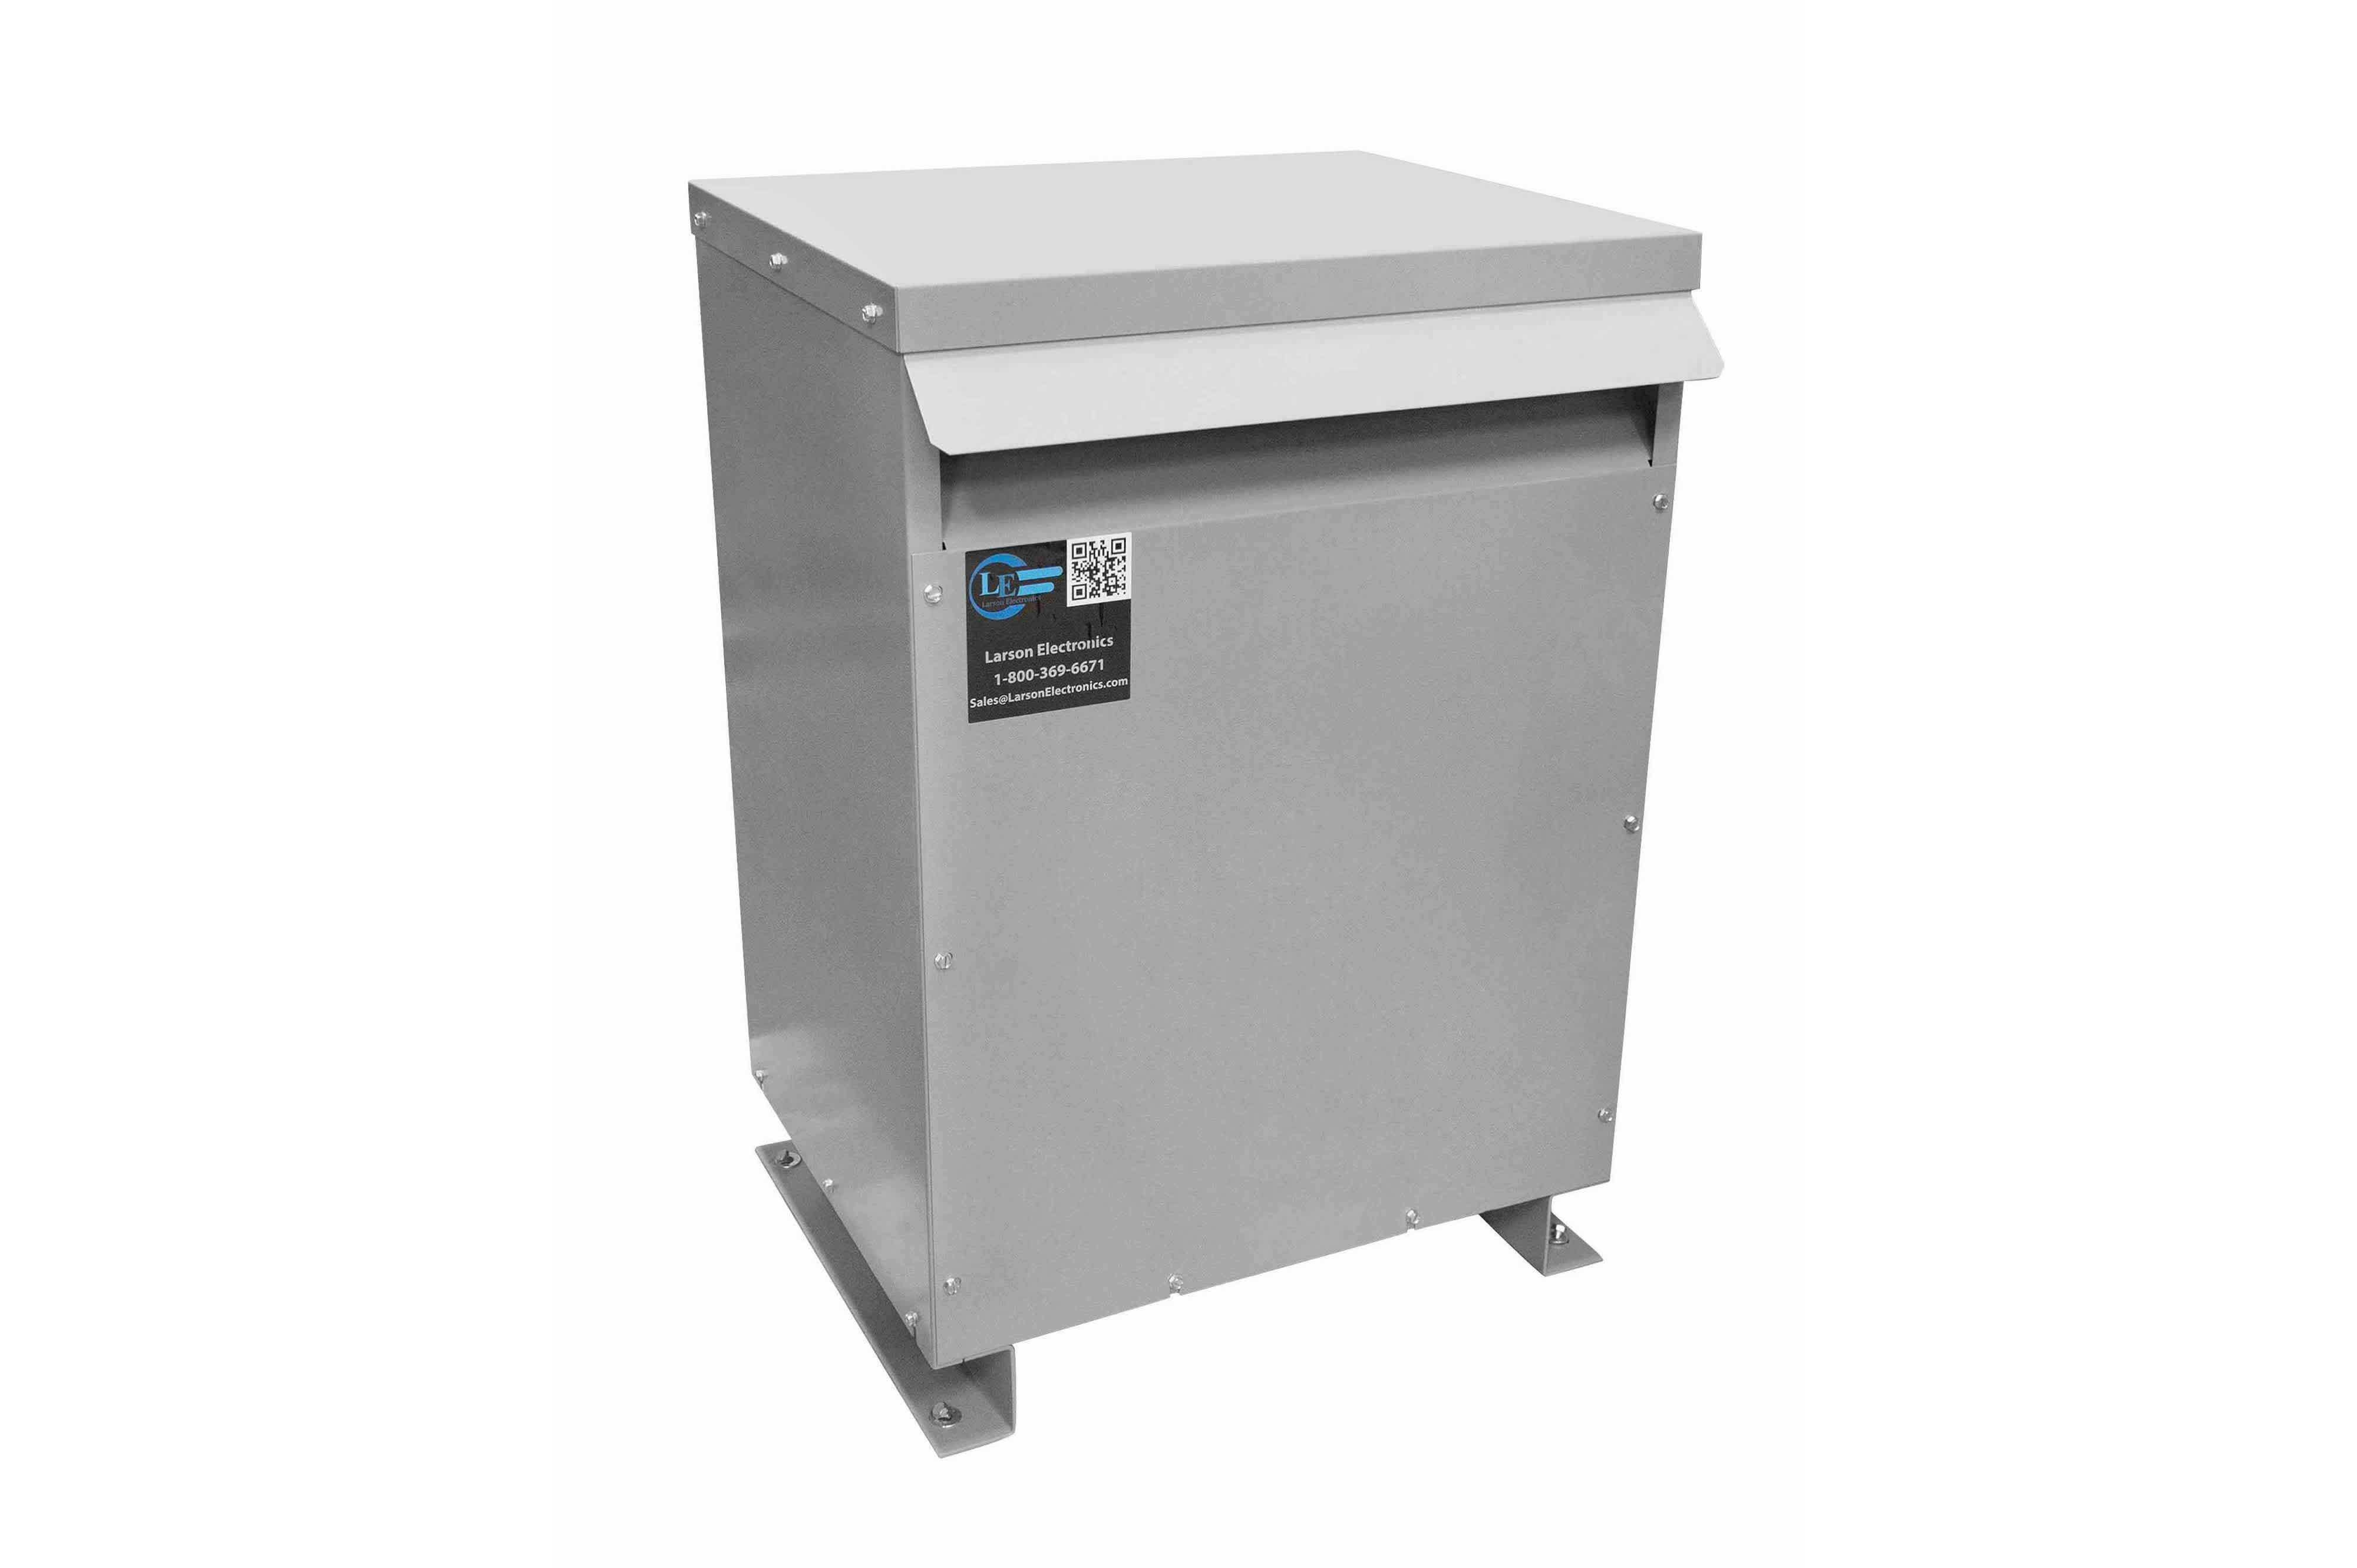 150 kVA 3PH Isolation Transformer, 460V Wye Primary, 600V Delta Secondary, N3R, Ventilated, 60 Hz